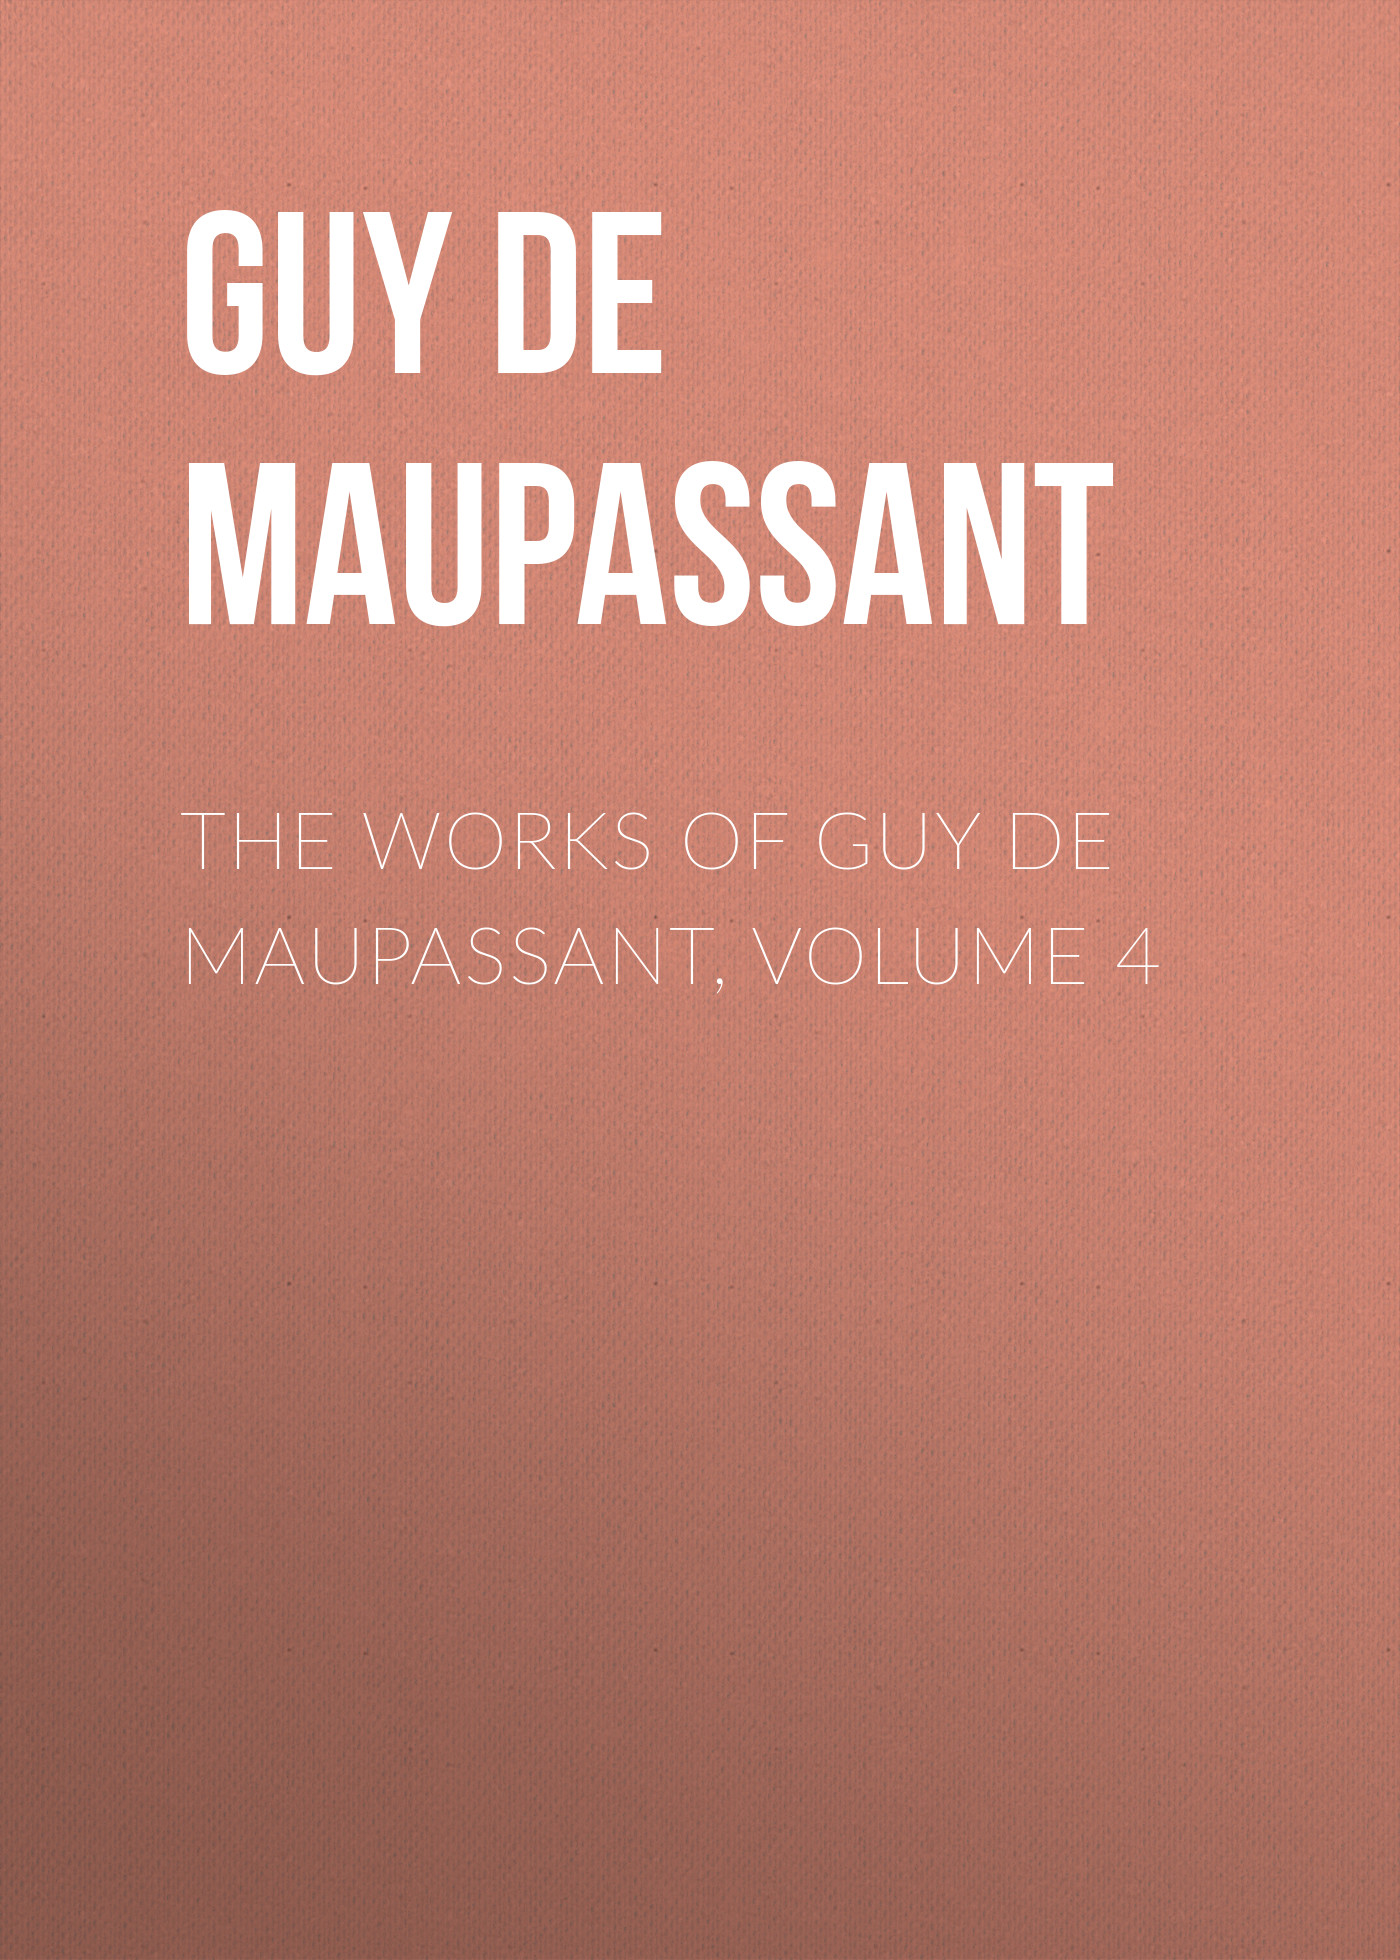 Ги де Мопассан The Works of Guy de Maupassant, Volume 4 ги де мопассан œuvres complètes de guy de maupassant volume 03